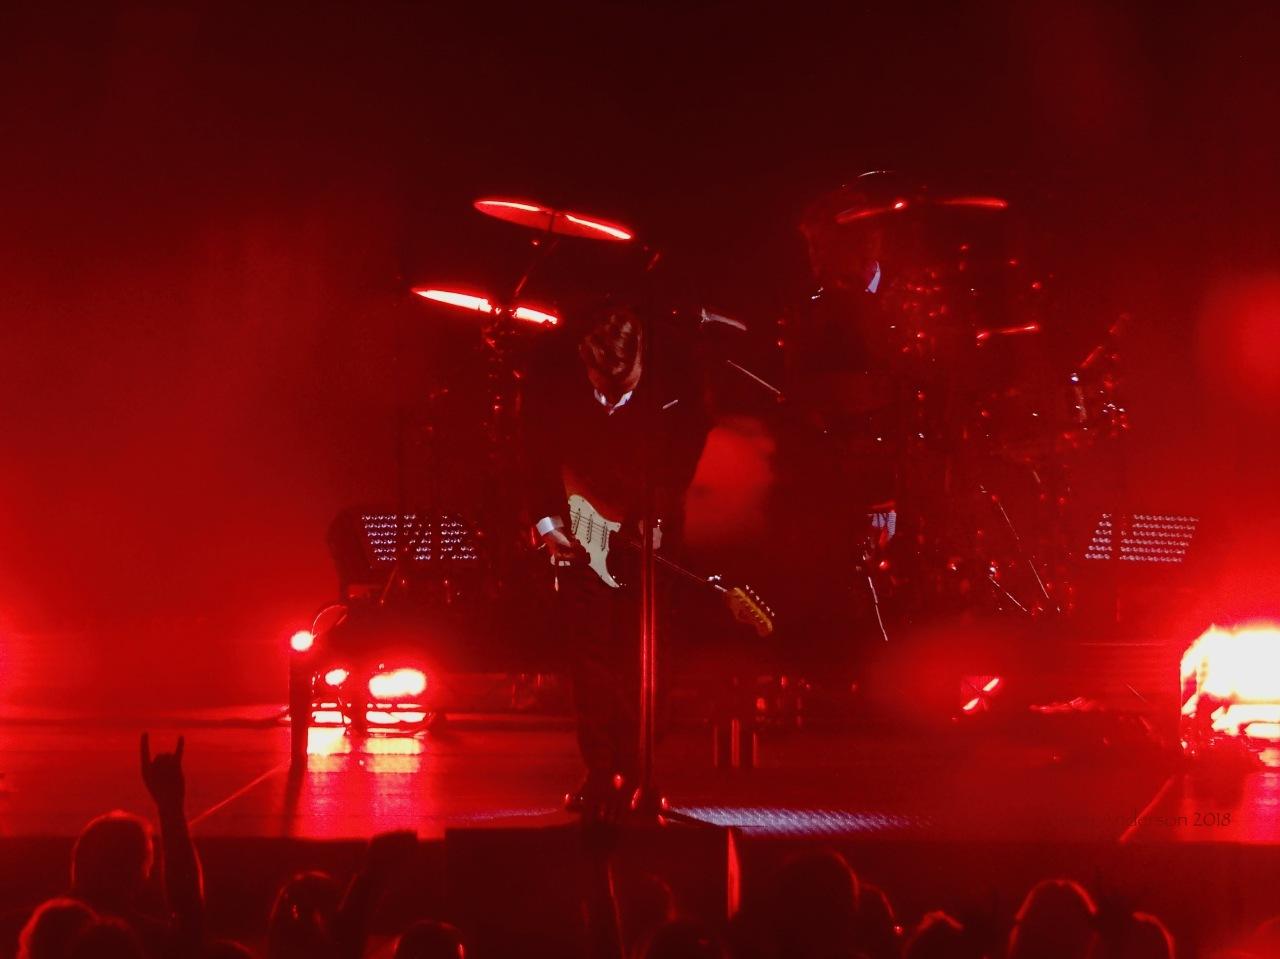 Bryan Adams Goodnight The Ultimate Tour Edmonton Rogers Place June 8 2018